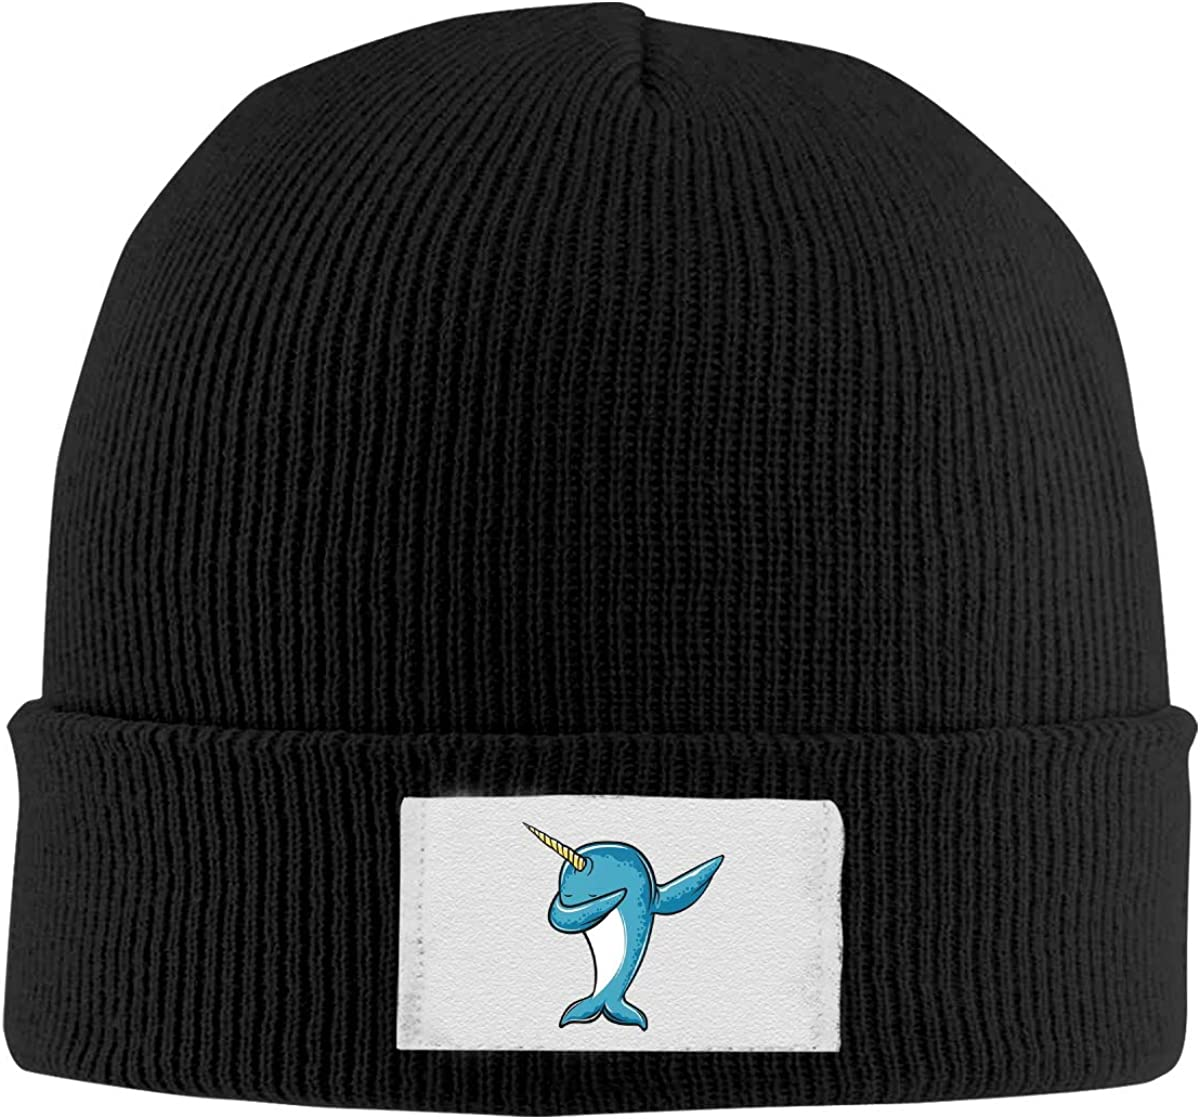 Unisex Stylish Slouch Beanie Hats Black Narwhal Dab Top Level Beanie Men Women